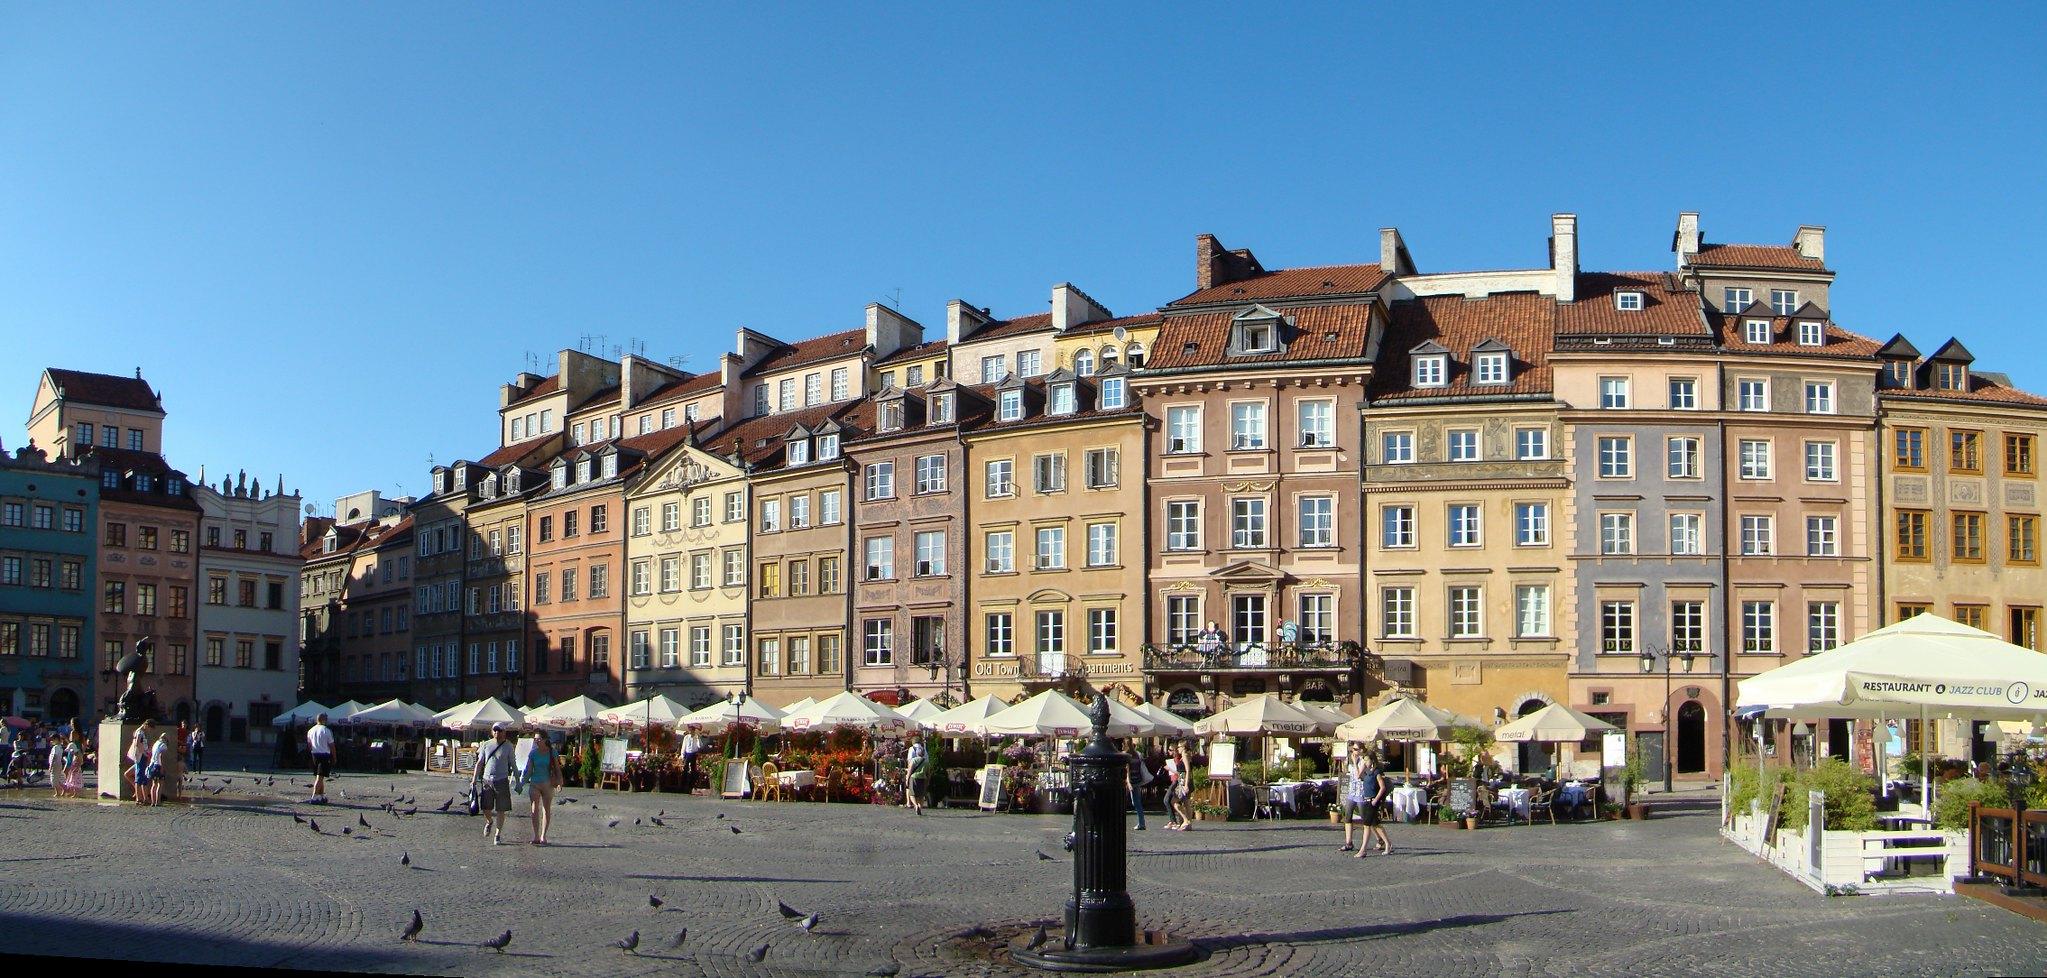 Mercado de la Ciudad Vieja Varsovia Polonia